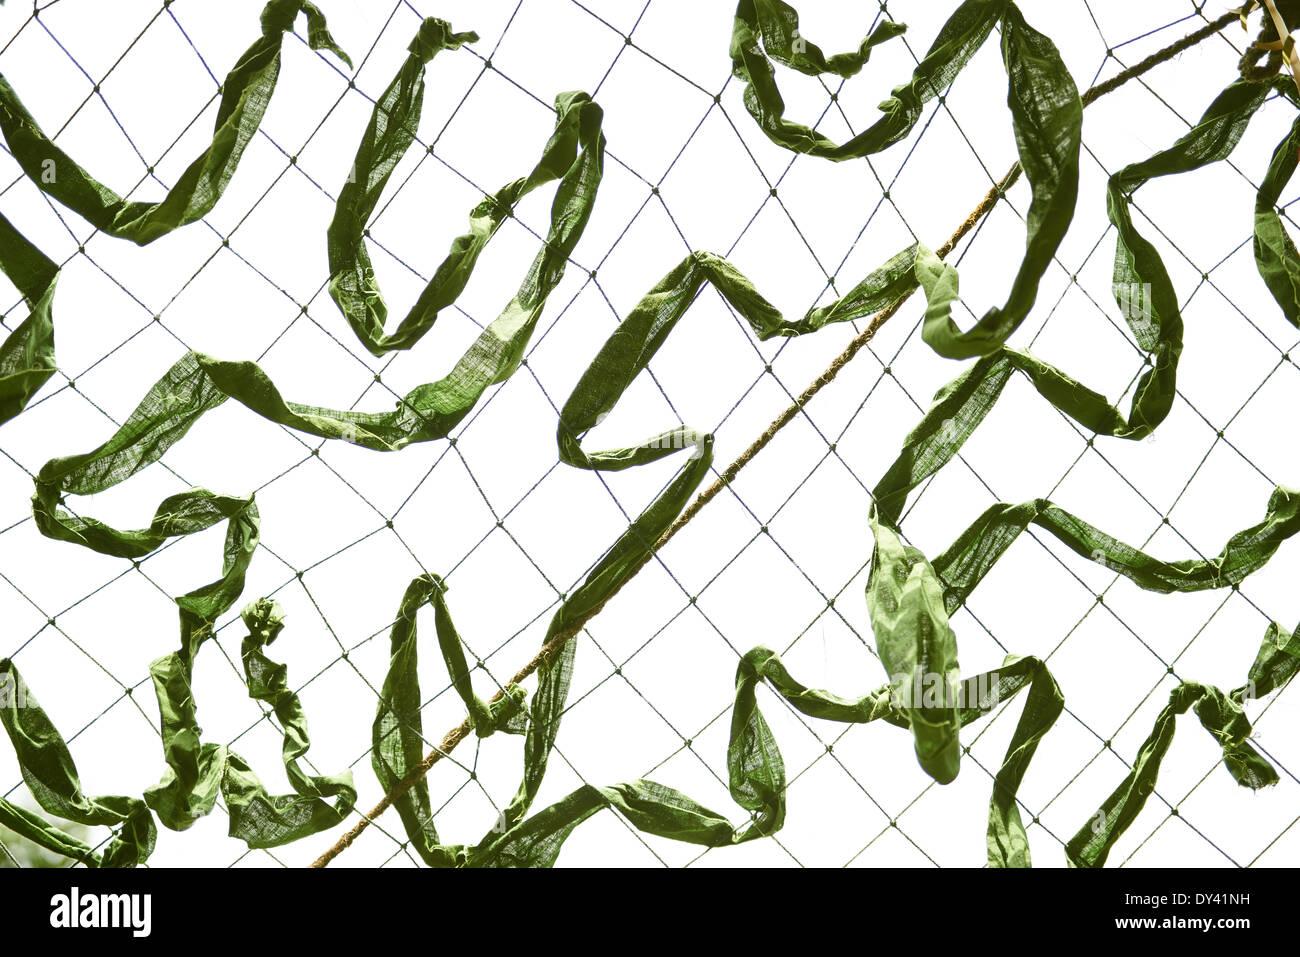 Green camouflage netting - Stock Image